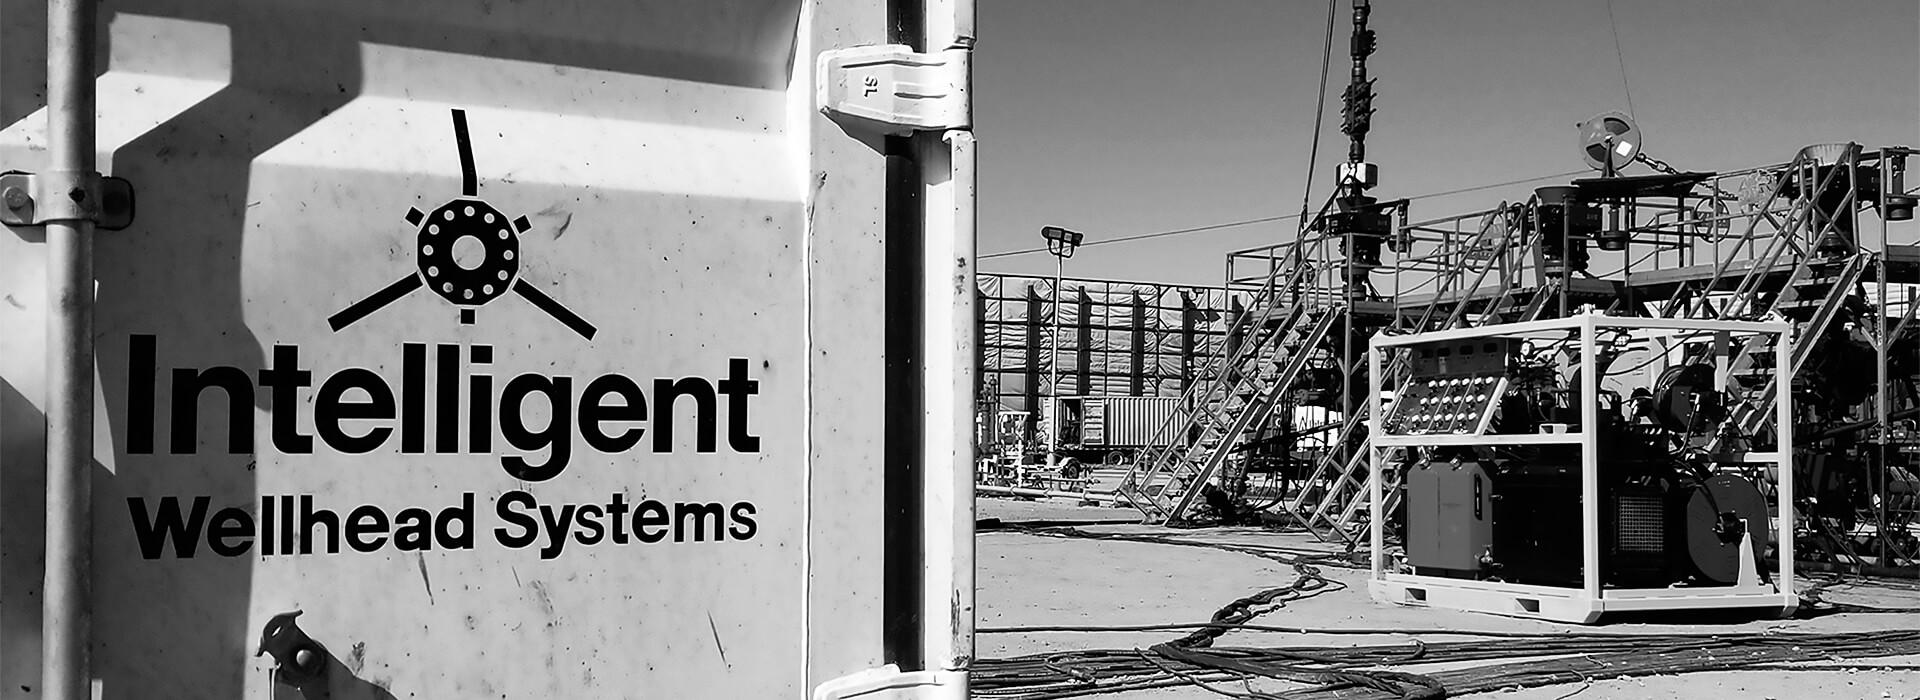 Intelligent Wellhead Systems b2b brand case study hero image